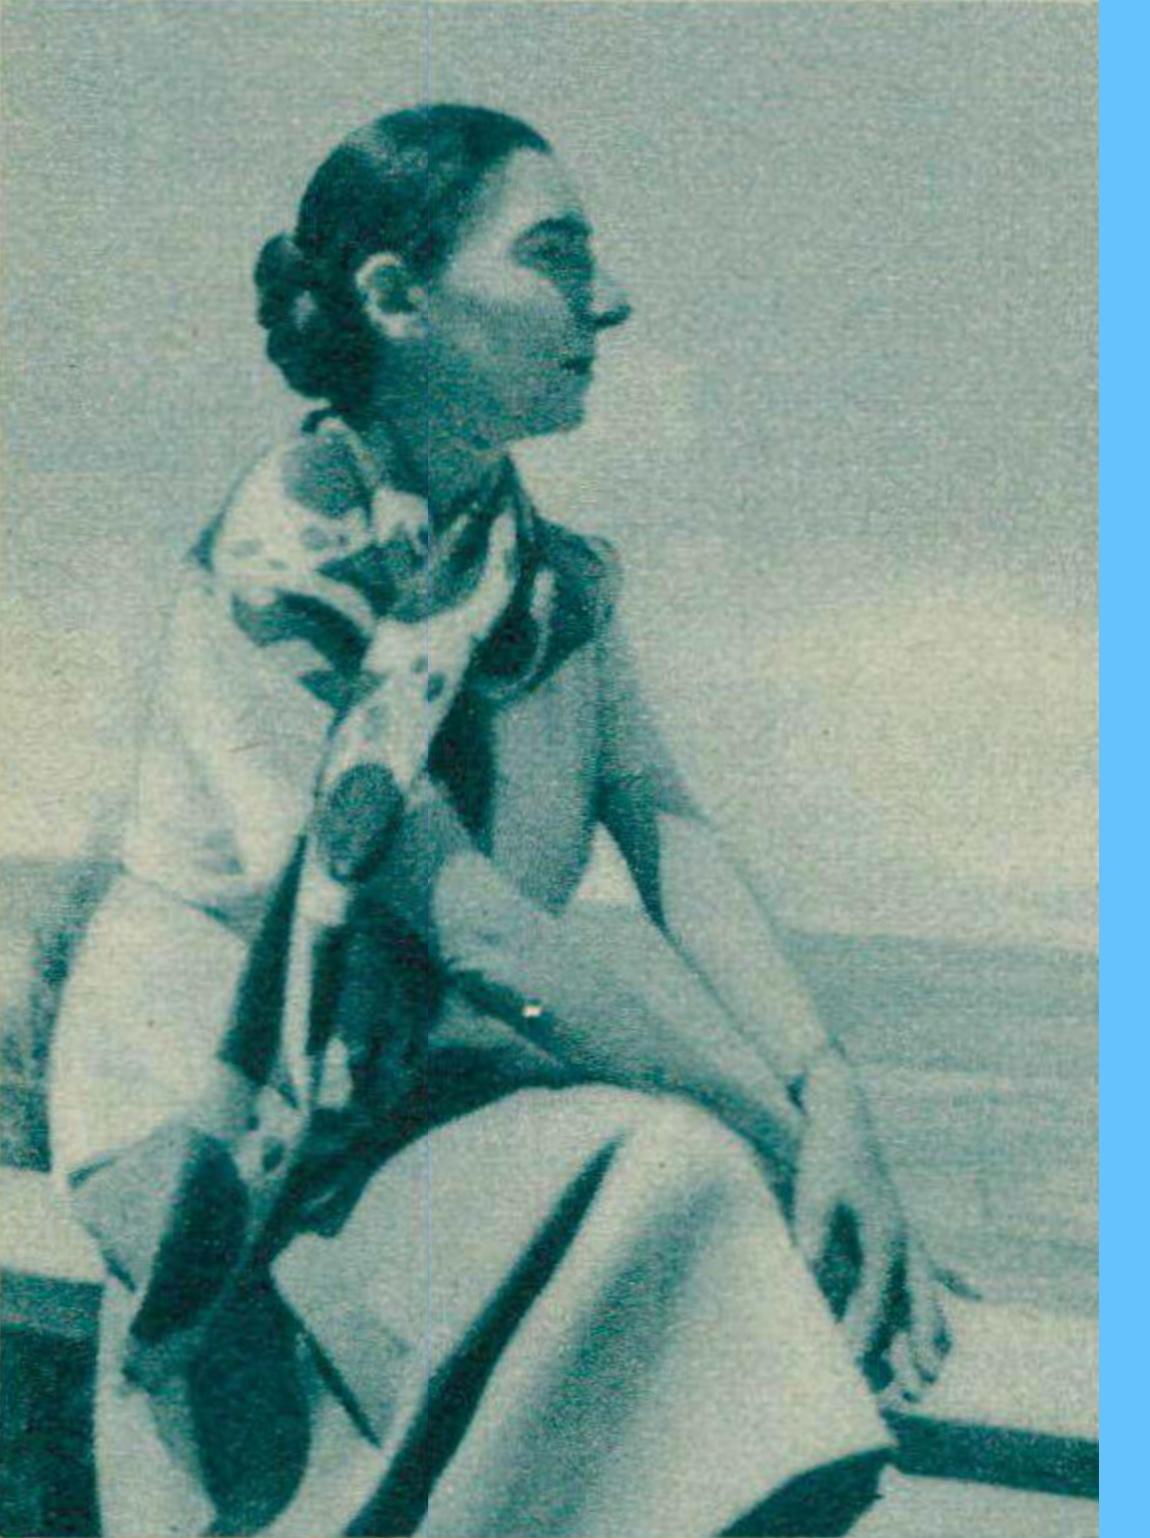 Wanda Landowska, Le Radio, 16 juillet 1937, page 1187